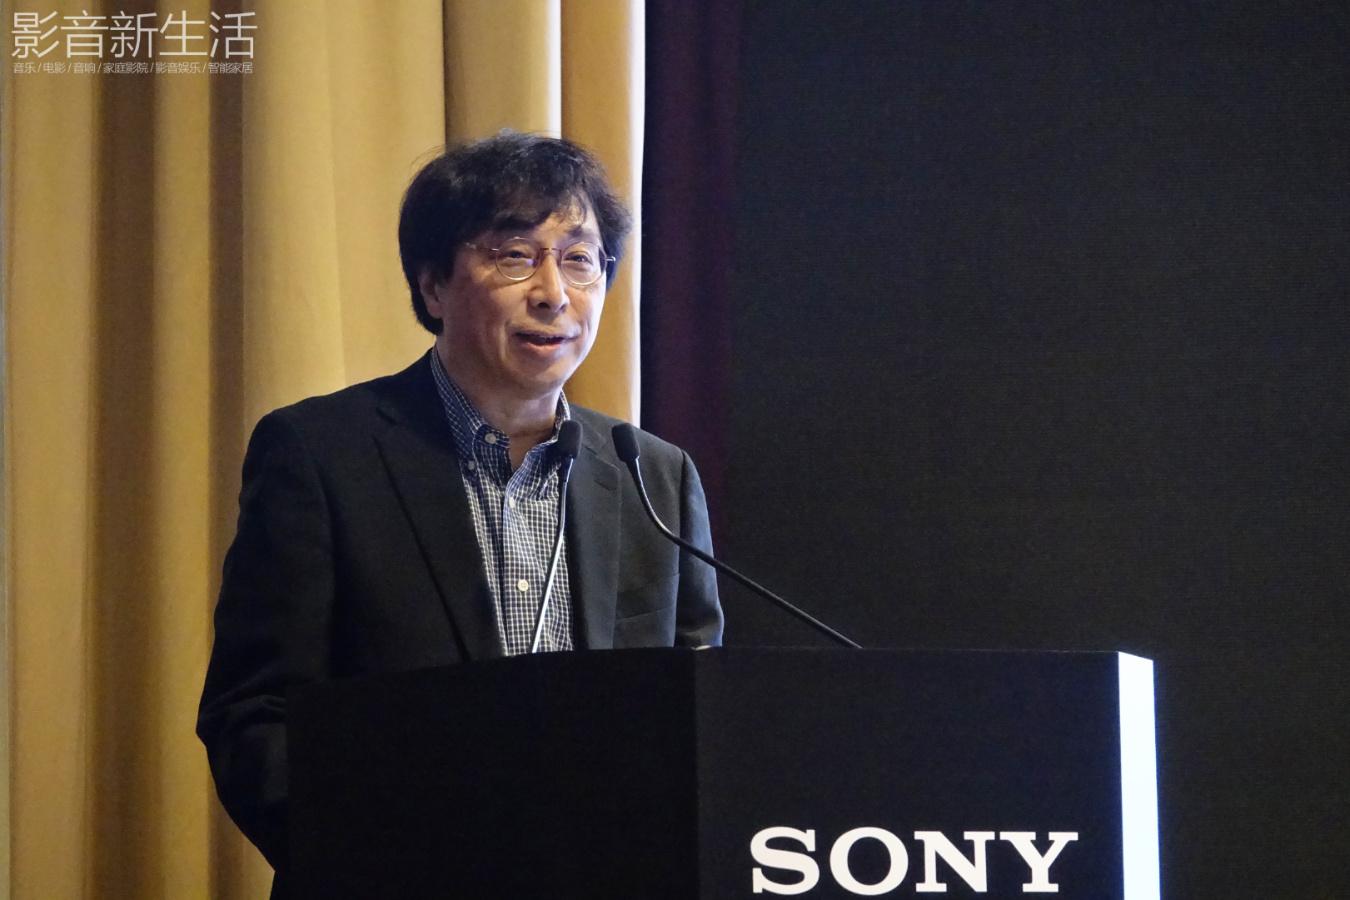 "Sony Hi Res 2018 41 - 新品 | ""重塑随身音乐娱乐王朝!"":Sony索尼发布Signature醇音系列新兄弟IER-Z1R和DMP-Z1,以及舞台监听耳机系列:IER-M7和IER-M9,还有升级款MDR-Z7M2!"